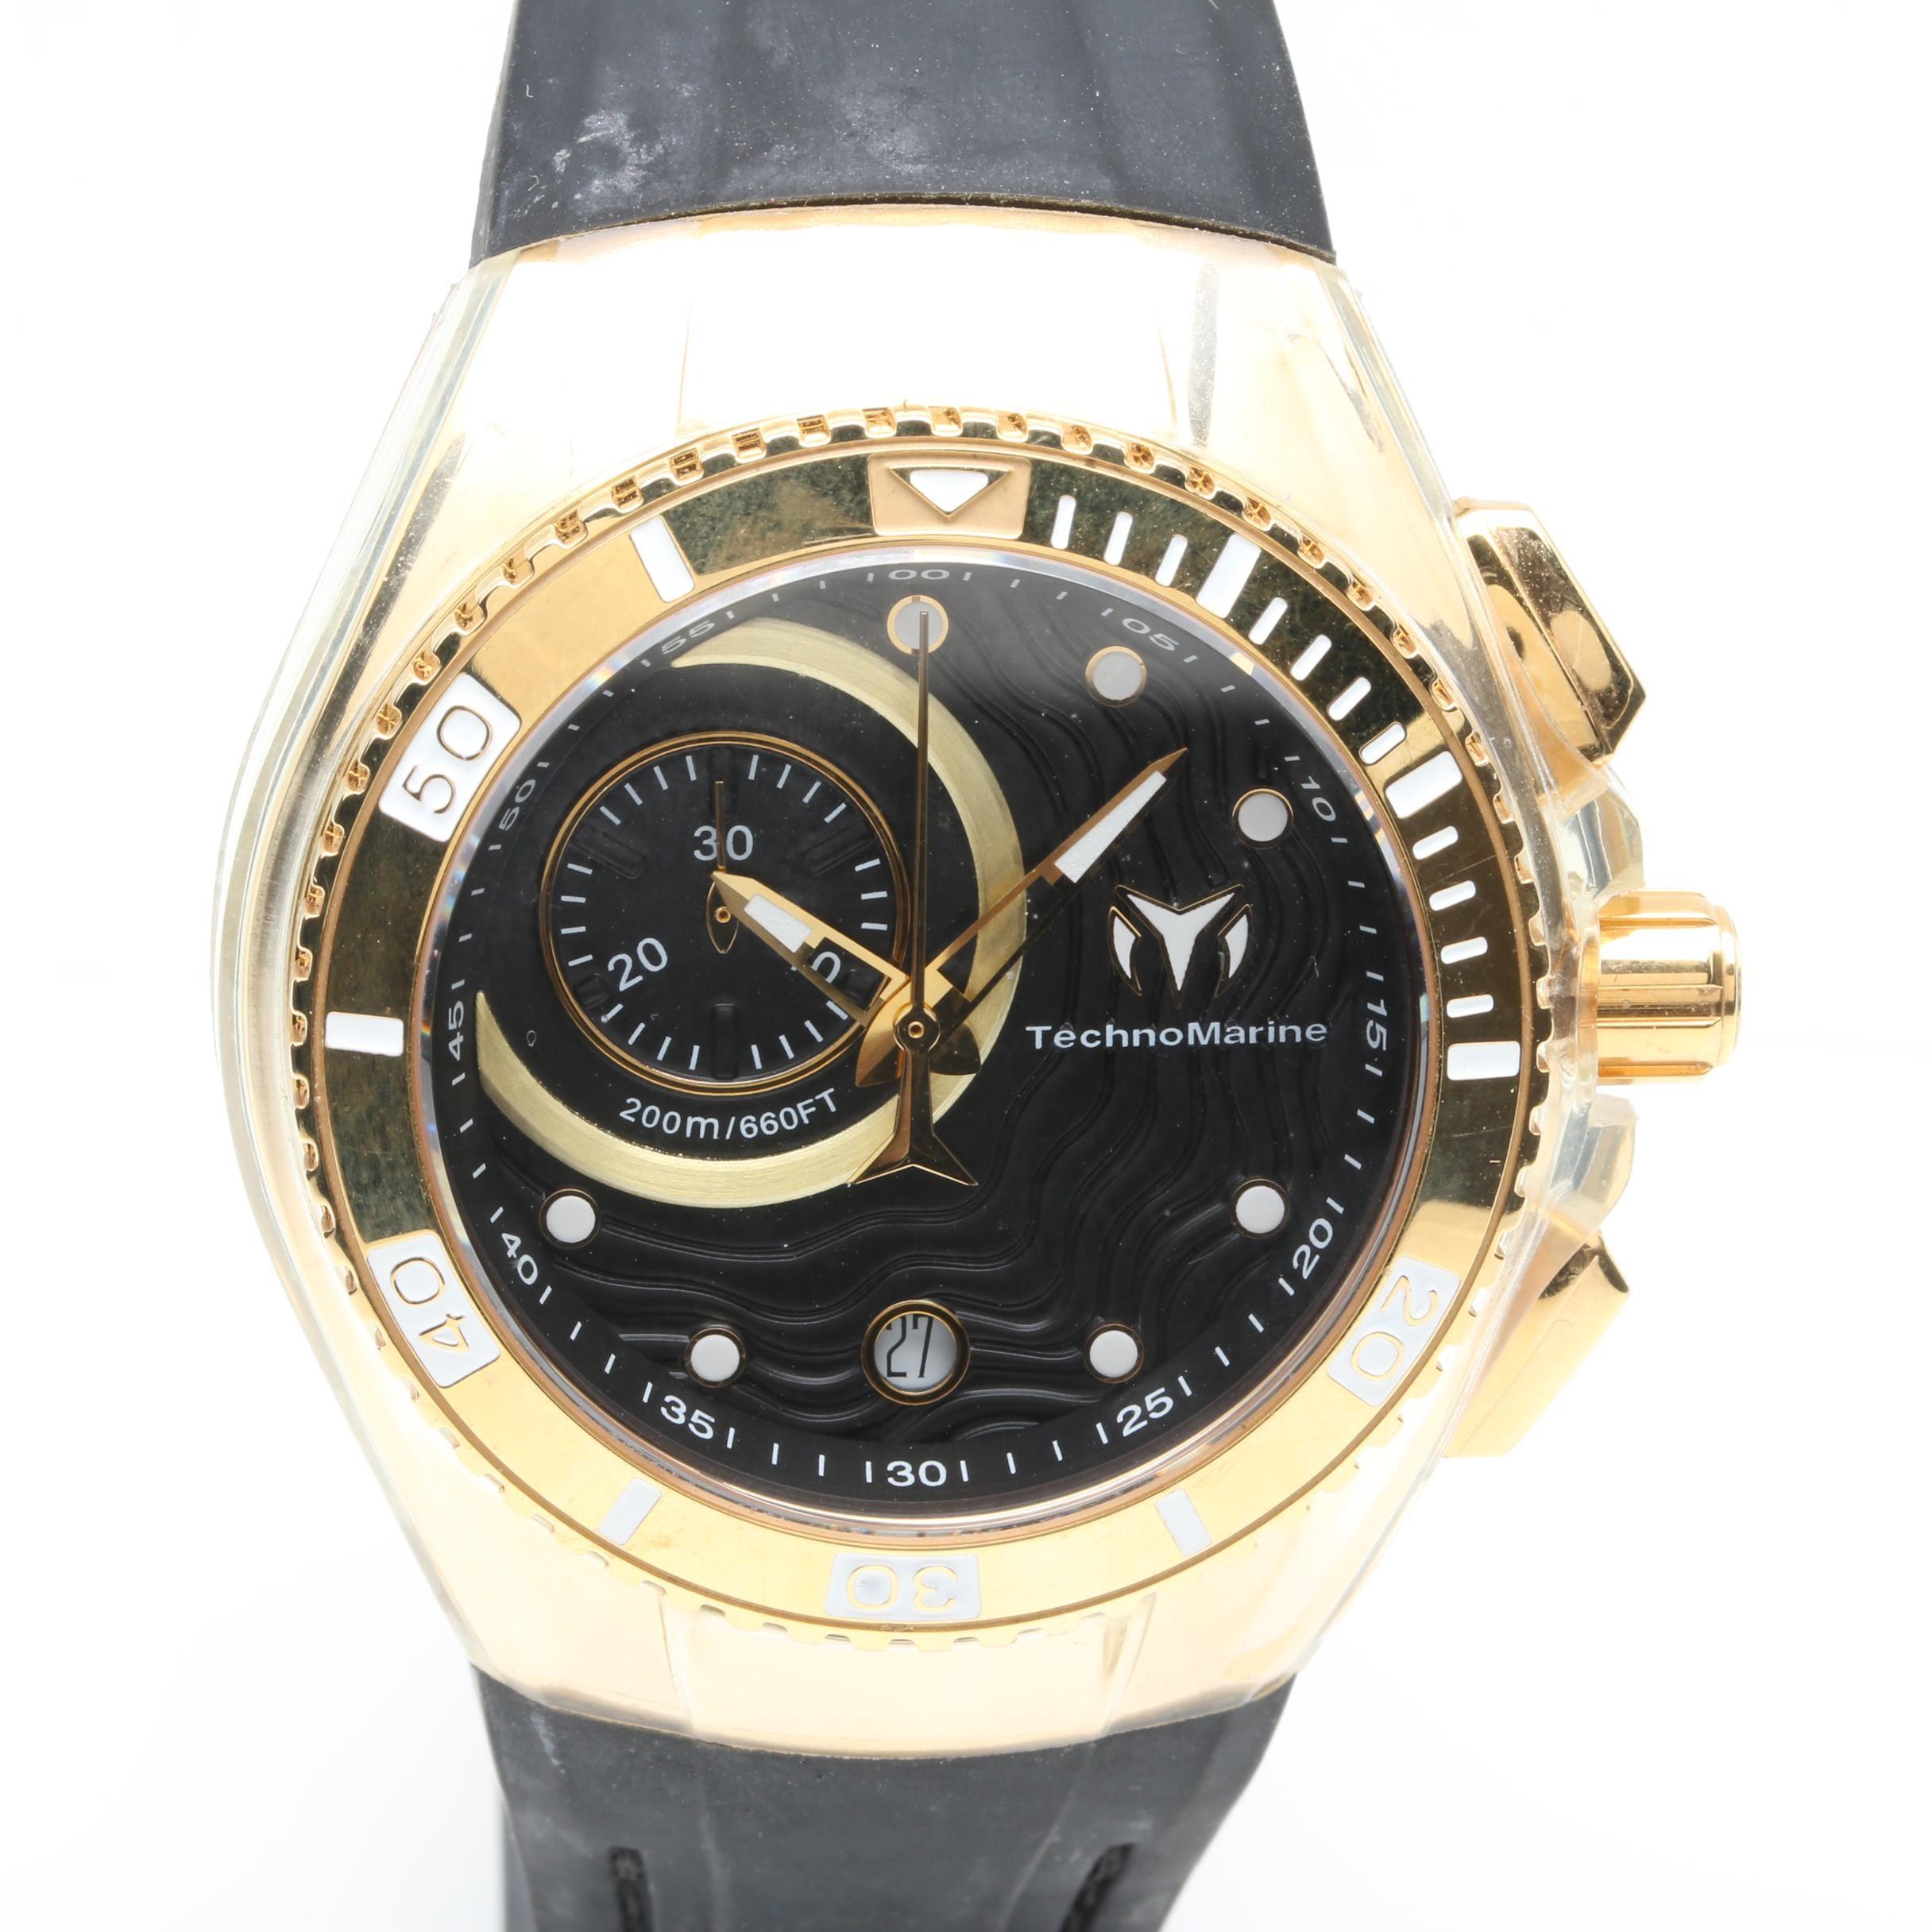 TechnoMarine Cruise One Stainless Steel Analog Wristwatch